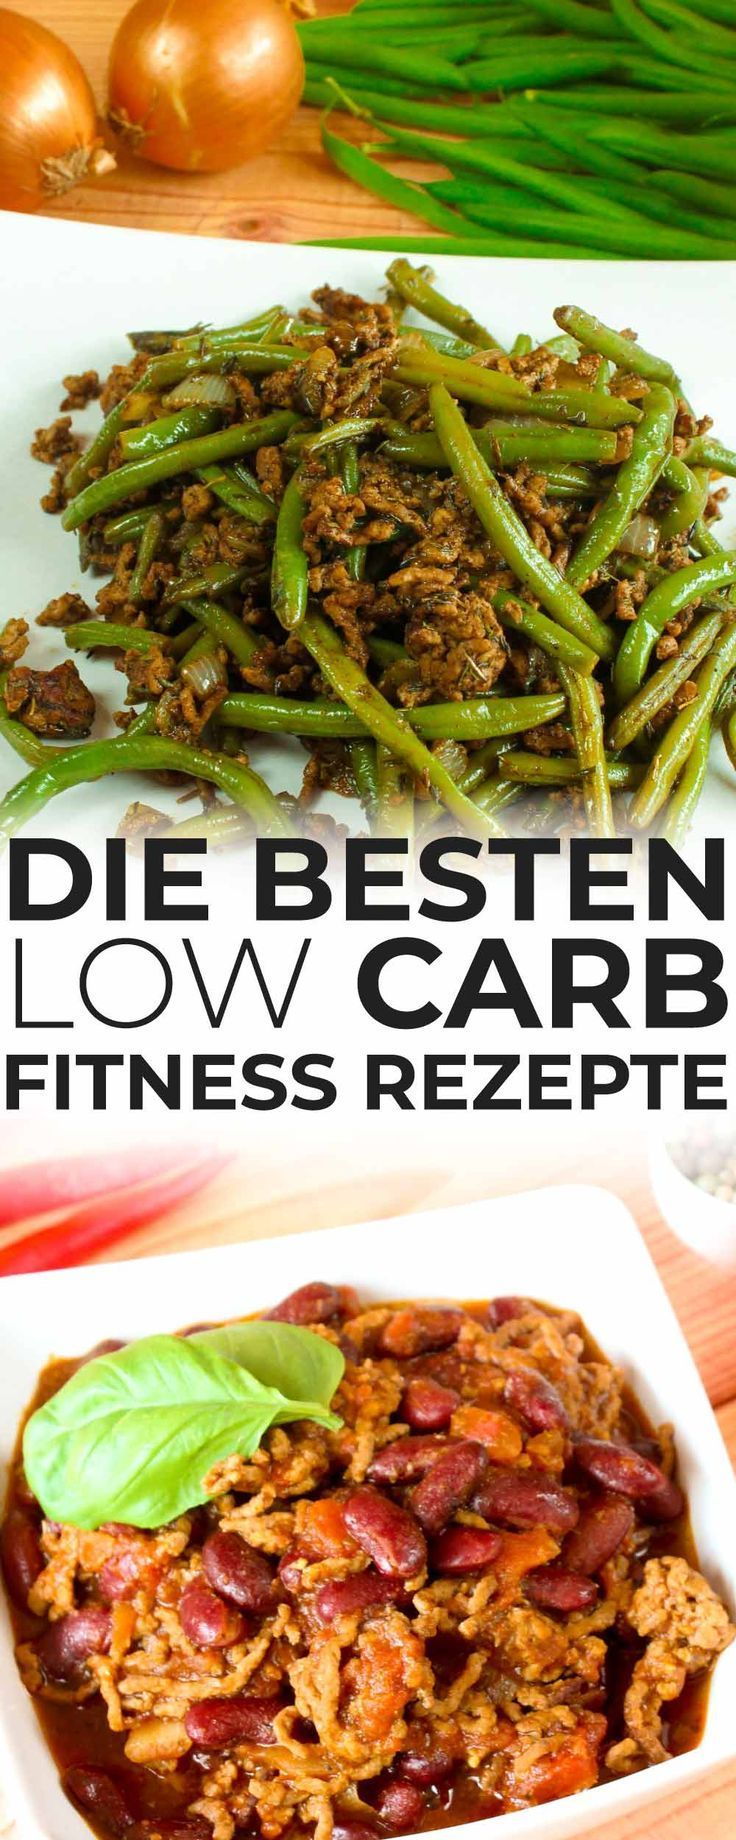 14 gesunde Fitness-Rezepte zum Abnehmen (+3 Bonus-Tipps) - #14 #3 #Abnehmen #Bonus-Tipps) #Fitness-R...